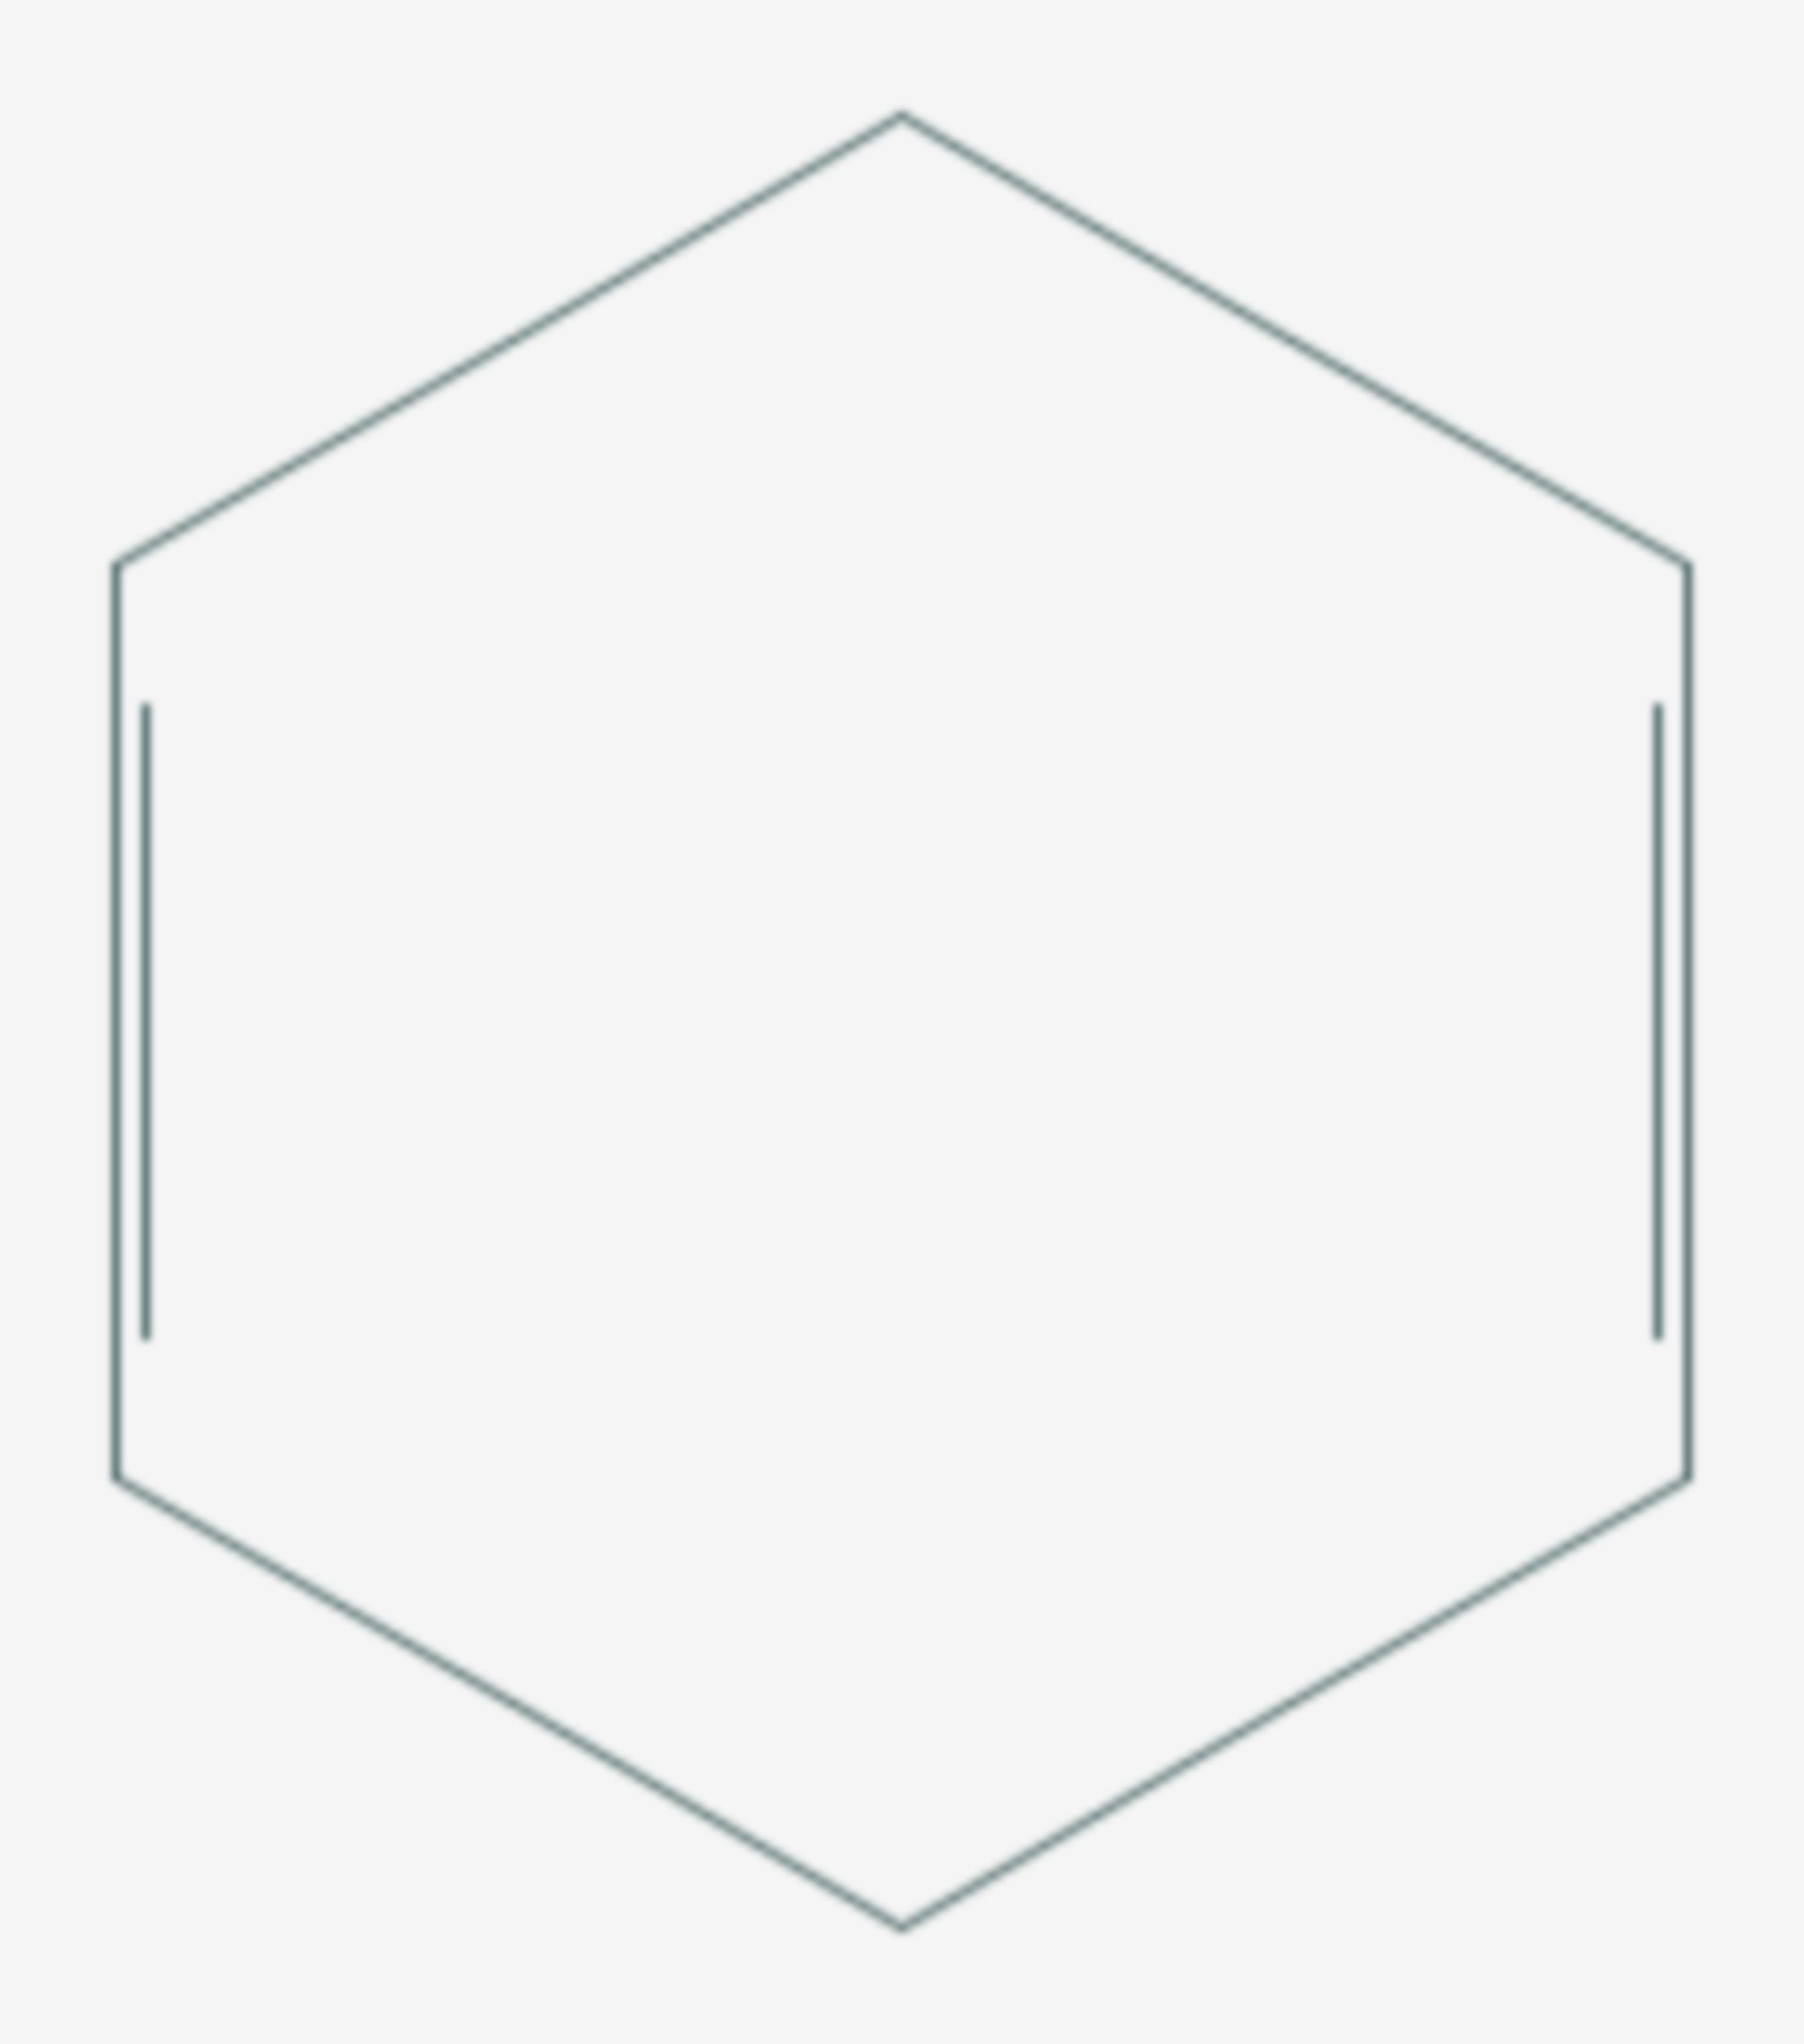 1,4-Cyclohexadien (Strukturformel)